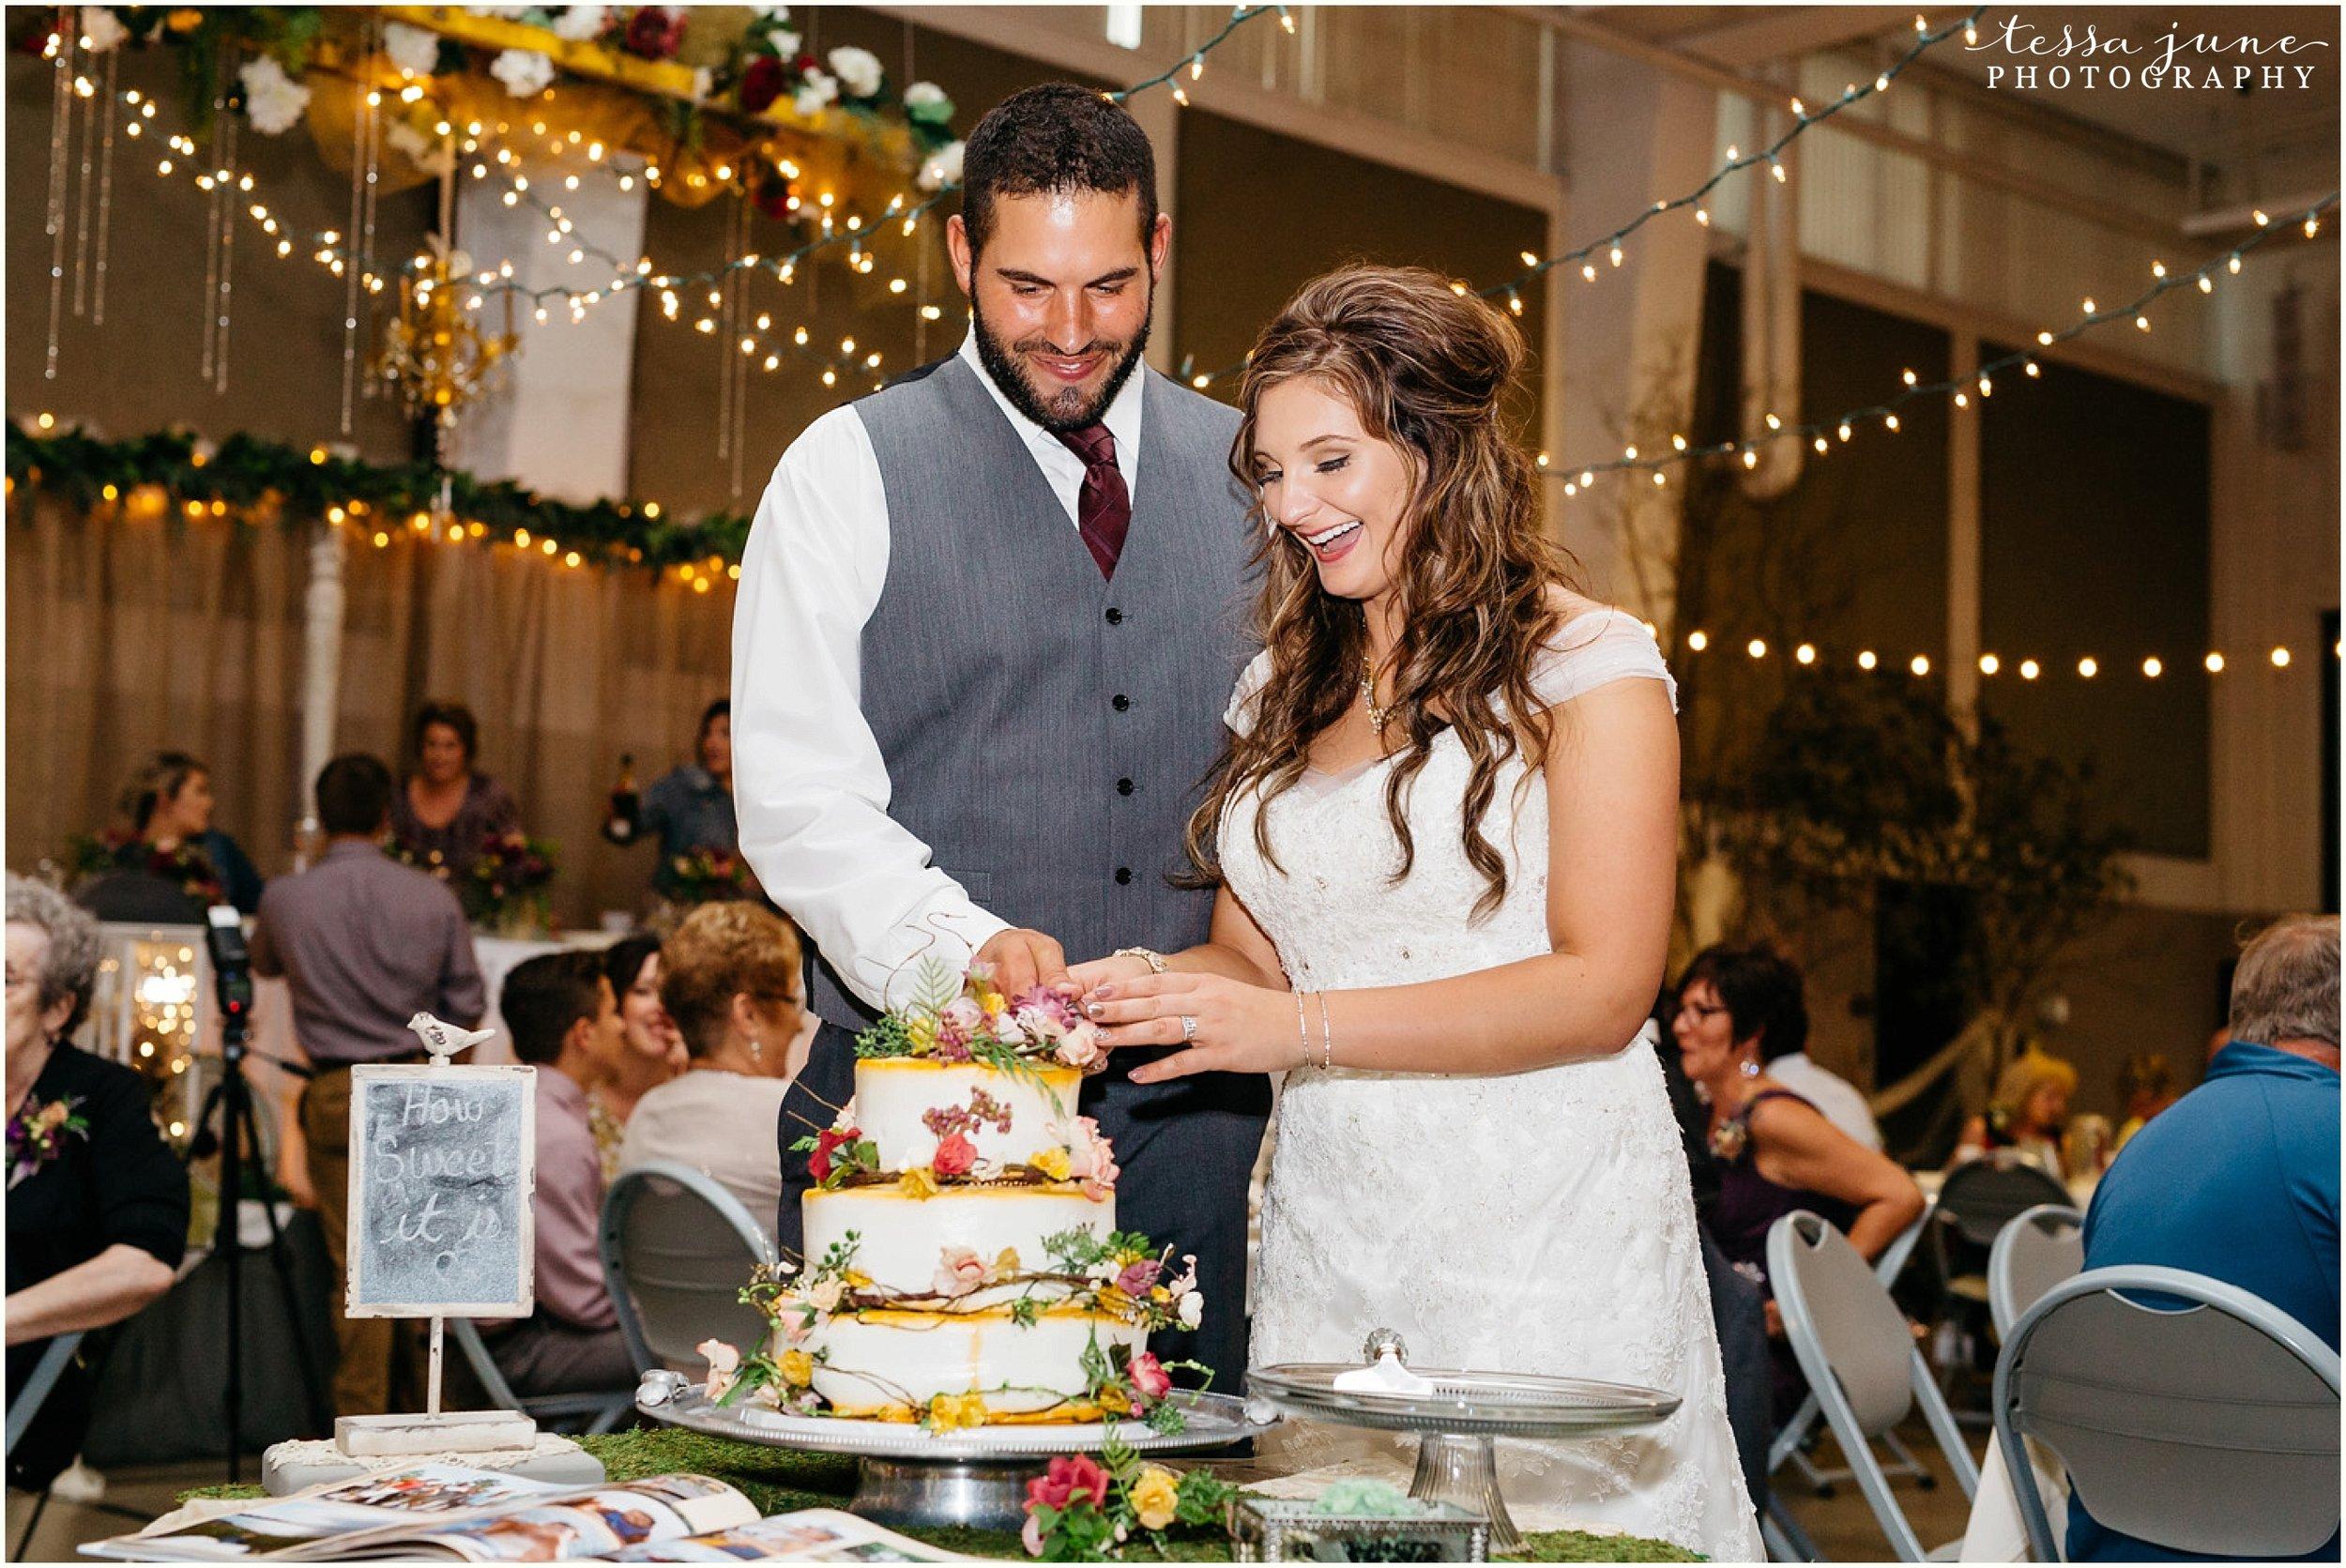 bohemian-minnesota-wedding-mismatched-bridesmaid-dresses-waterfall-st-cloud-tessa-june-photography-168.jpg